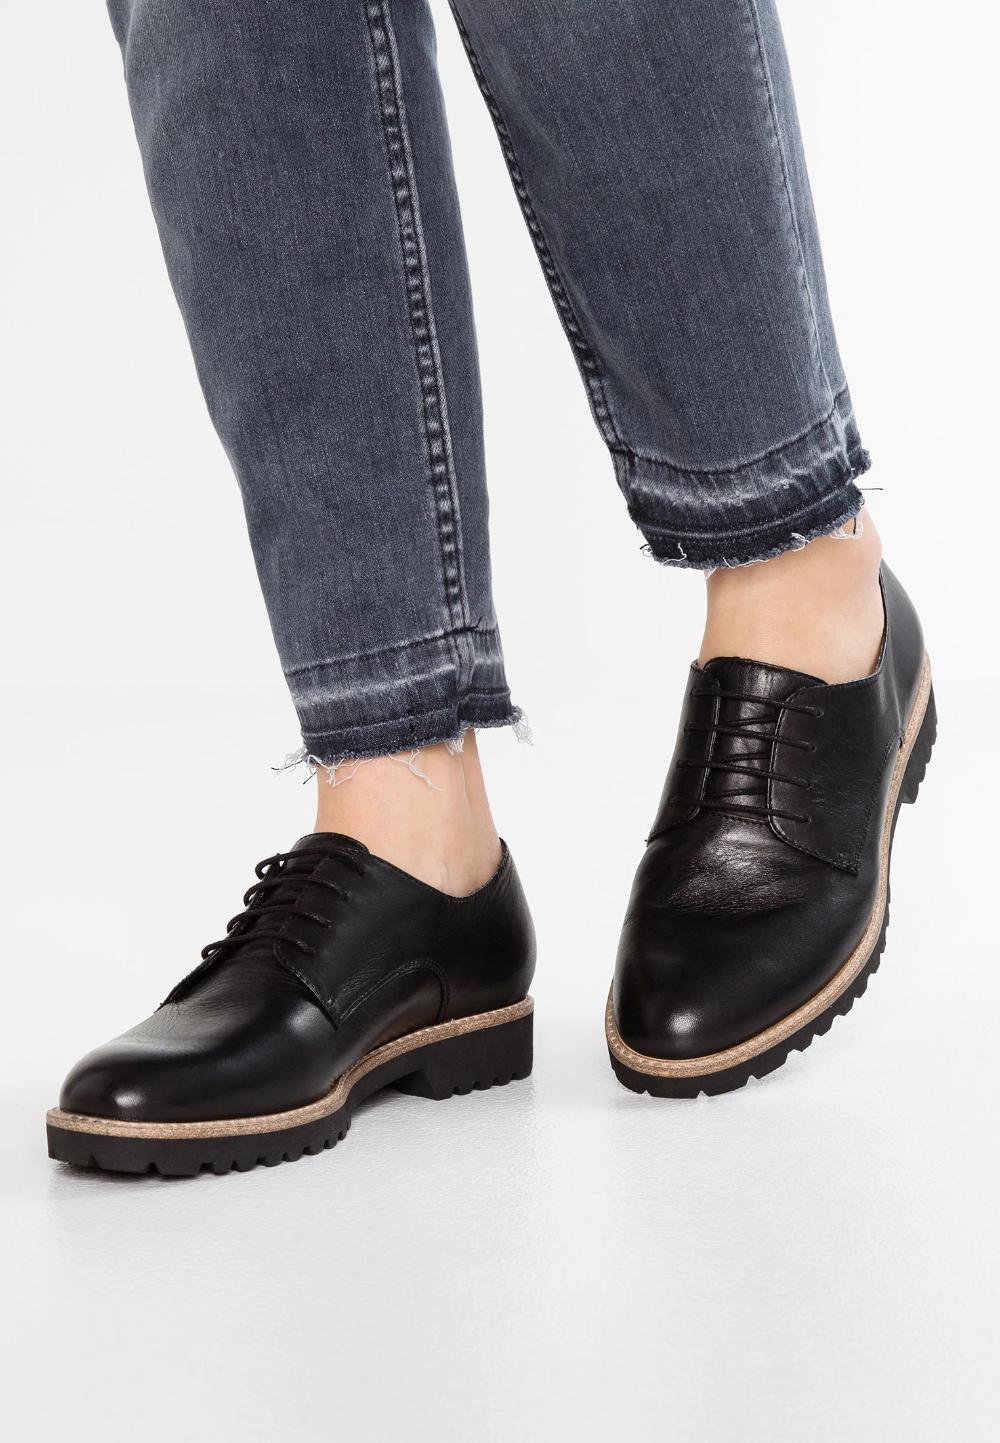 Tamaris Oksfordki Black Zalando Pl Block Heel Shoes Womens Oxfords Doc Martens Oxfords